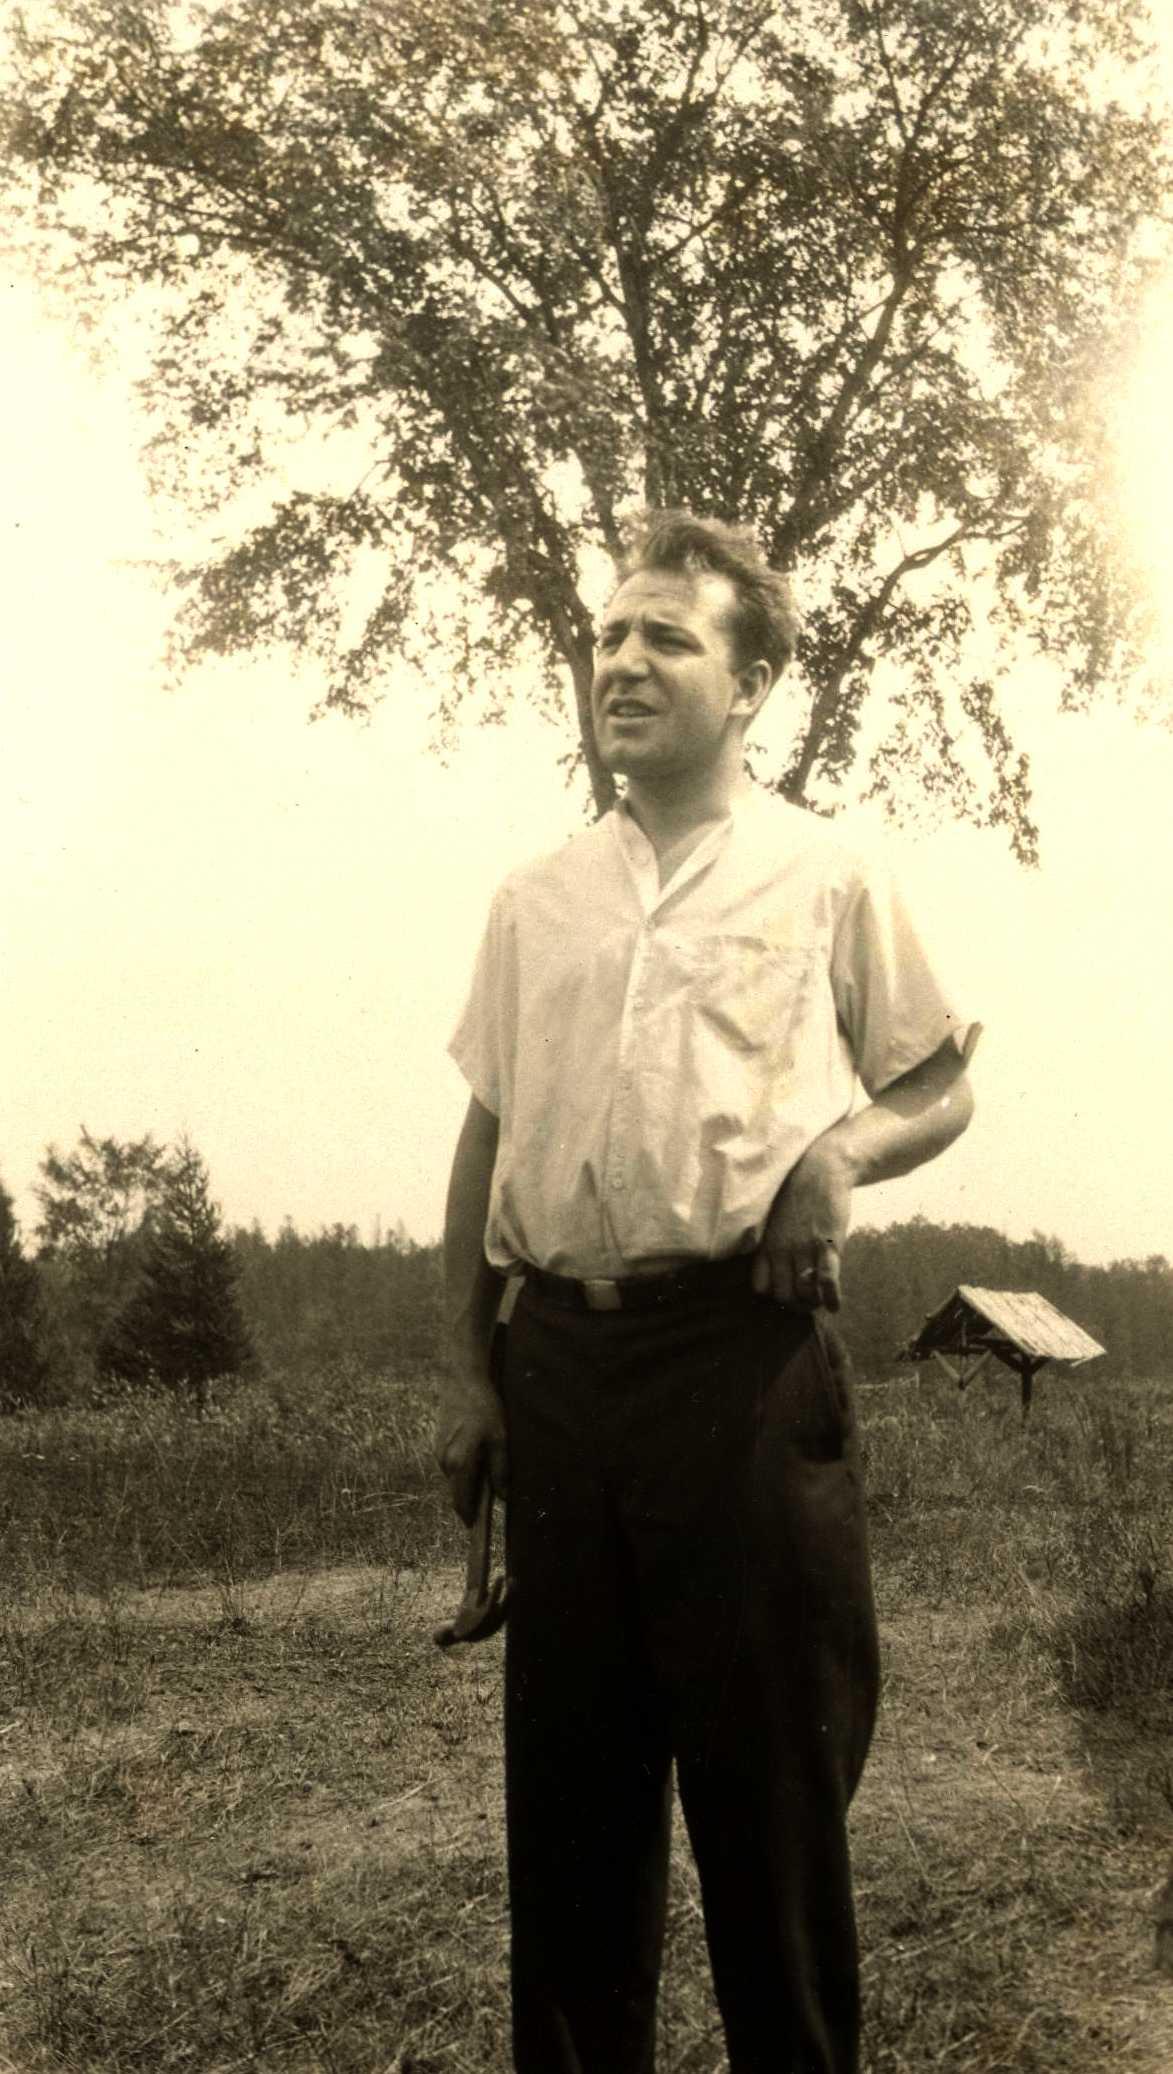 Laurance Labadie a Bubbling Waters, fotografiat per Charles Mentz (31 d'agost de 1930)